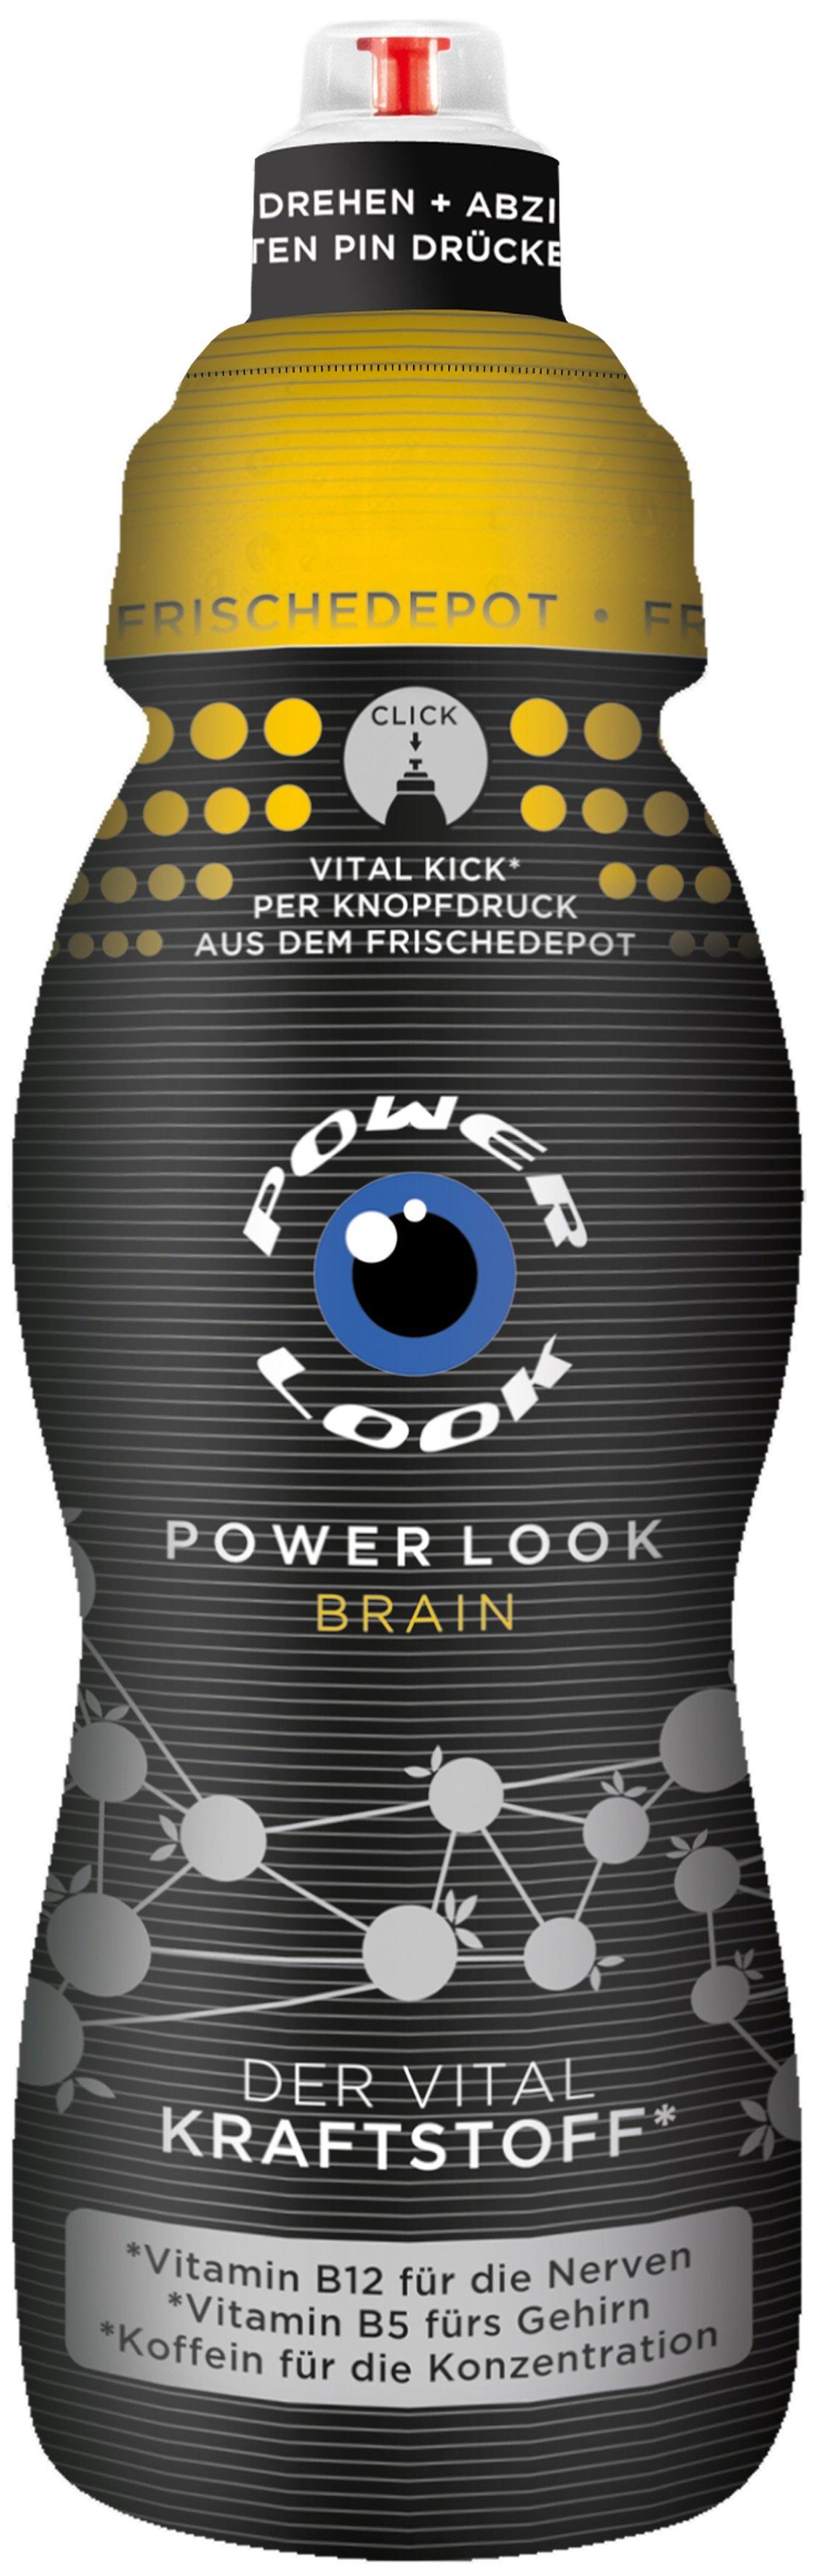 POWERLOOK BRAIN